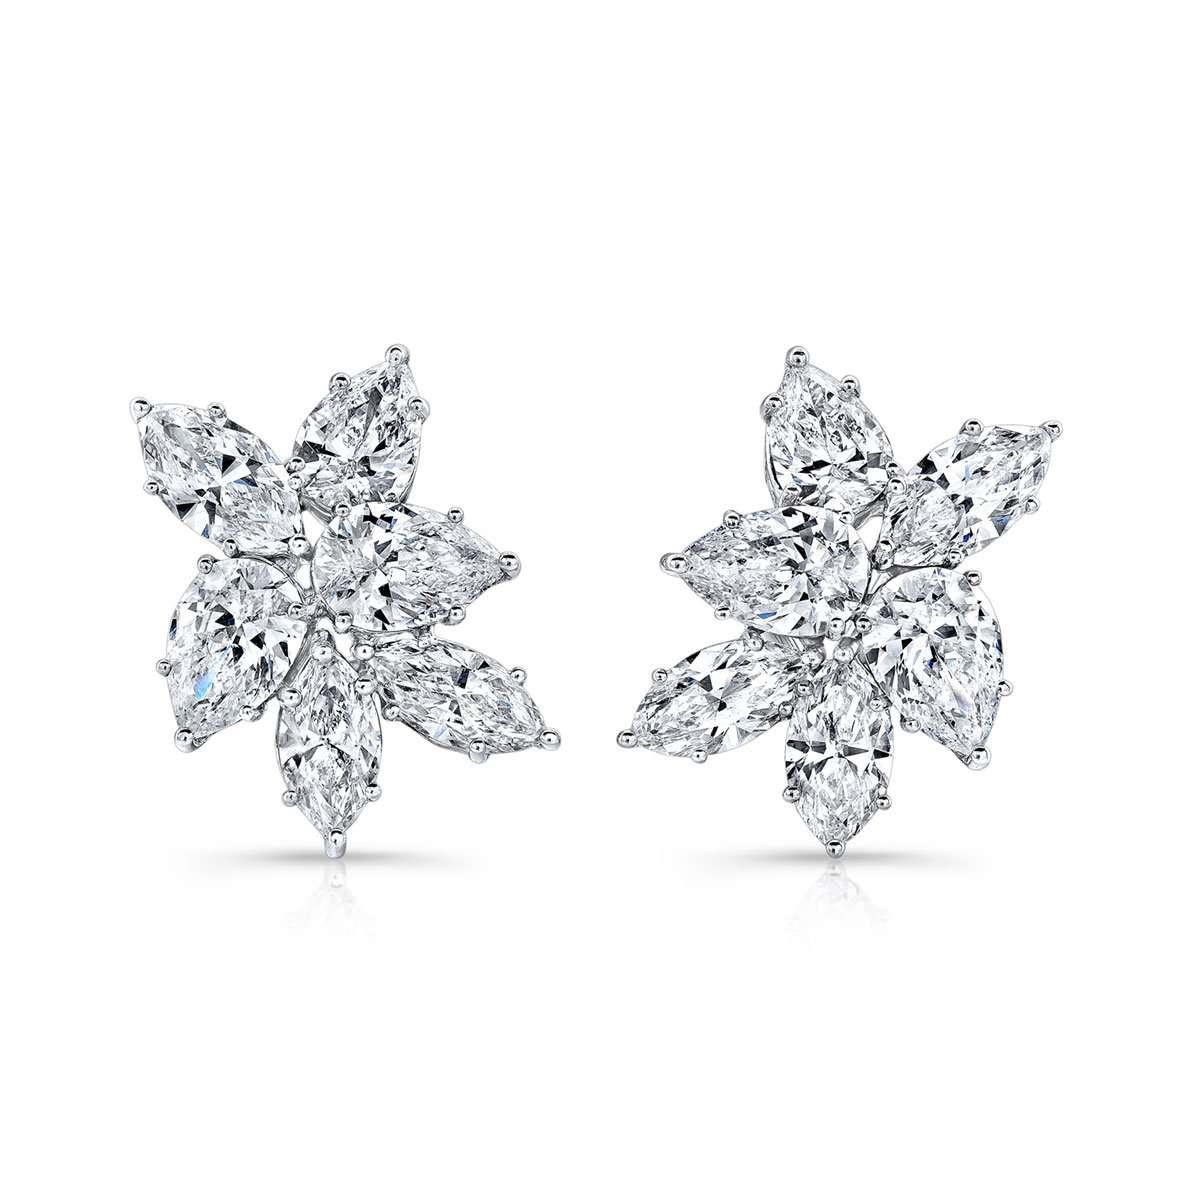 Deutsch Signature Diamond Cluster Earrings